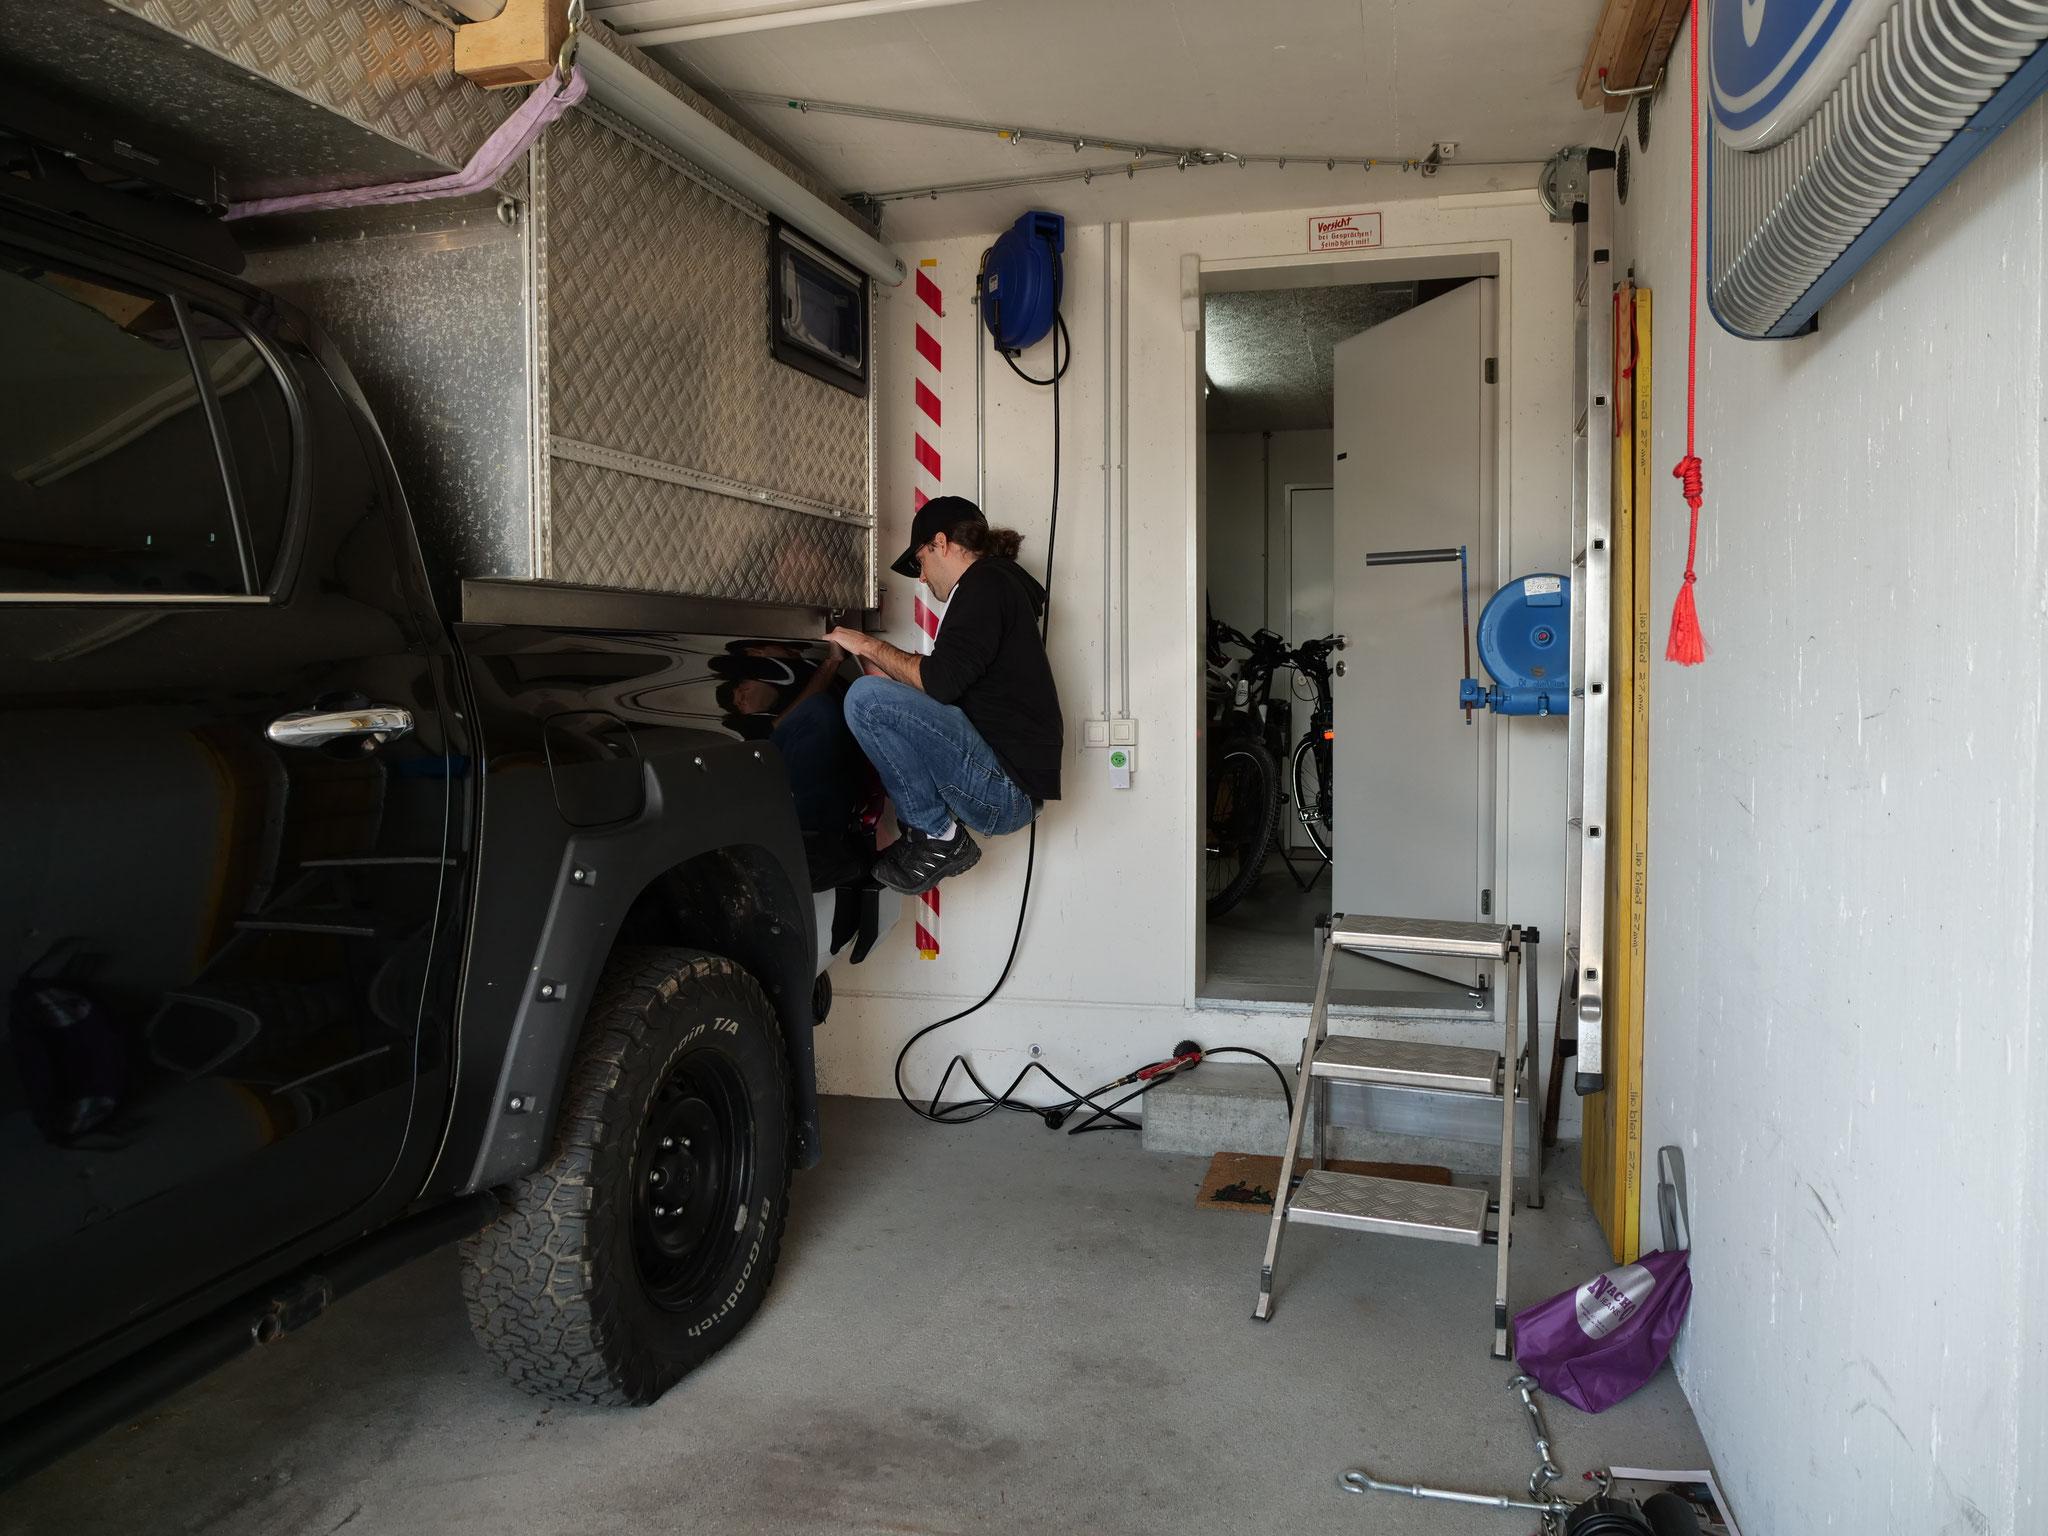 "Toyota Hilux Revo 2017 2.4 #ProjektBlackwolf  truckcamper Wohnkabine 4x4 ARB Fahrwerk Frontrunner Rocksliders Roofrack Rival skidplate  bfgoodrich 285/70R17 33"" Tires TJM Sknorkel Exkab 1 offroad Tacoma expedition overland wolf78-overland.ch"